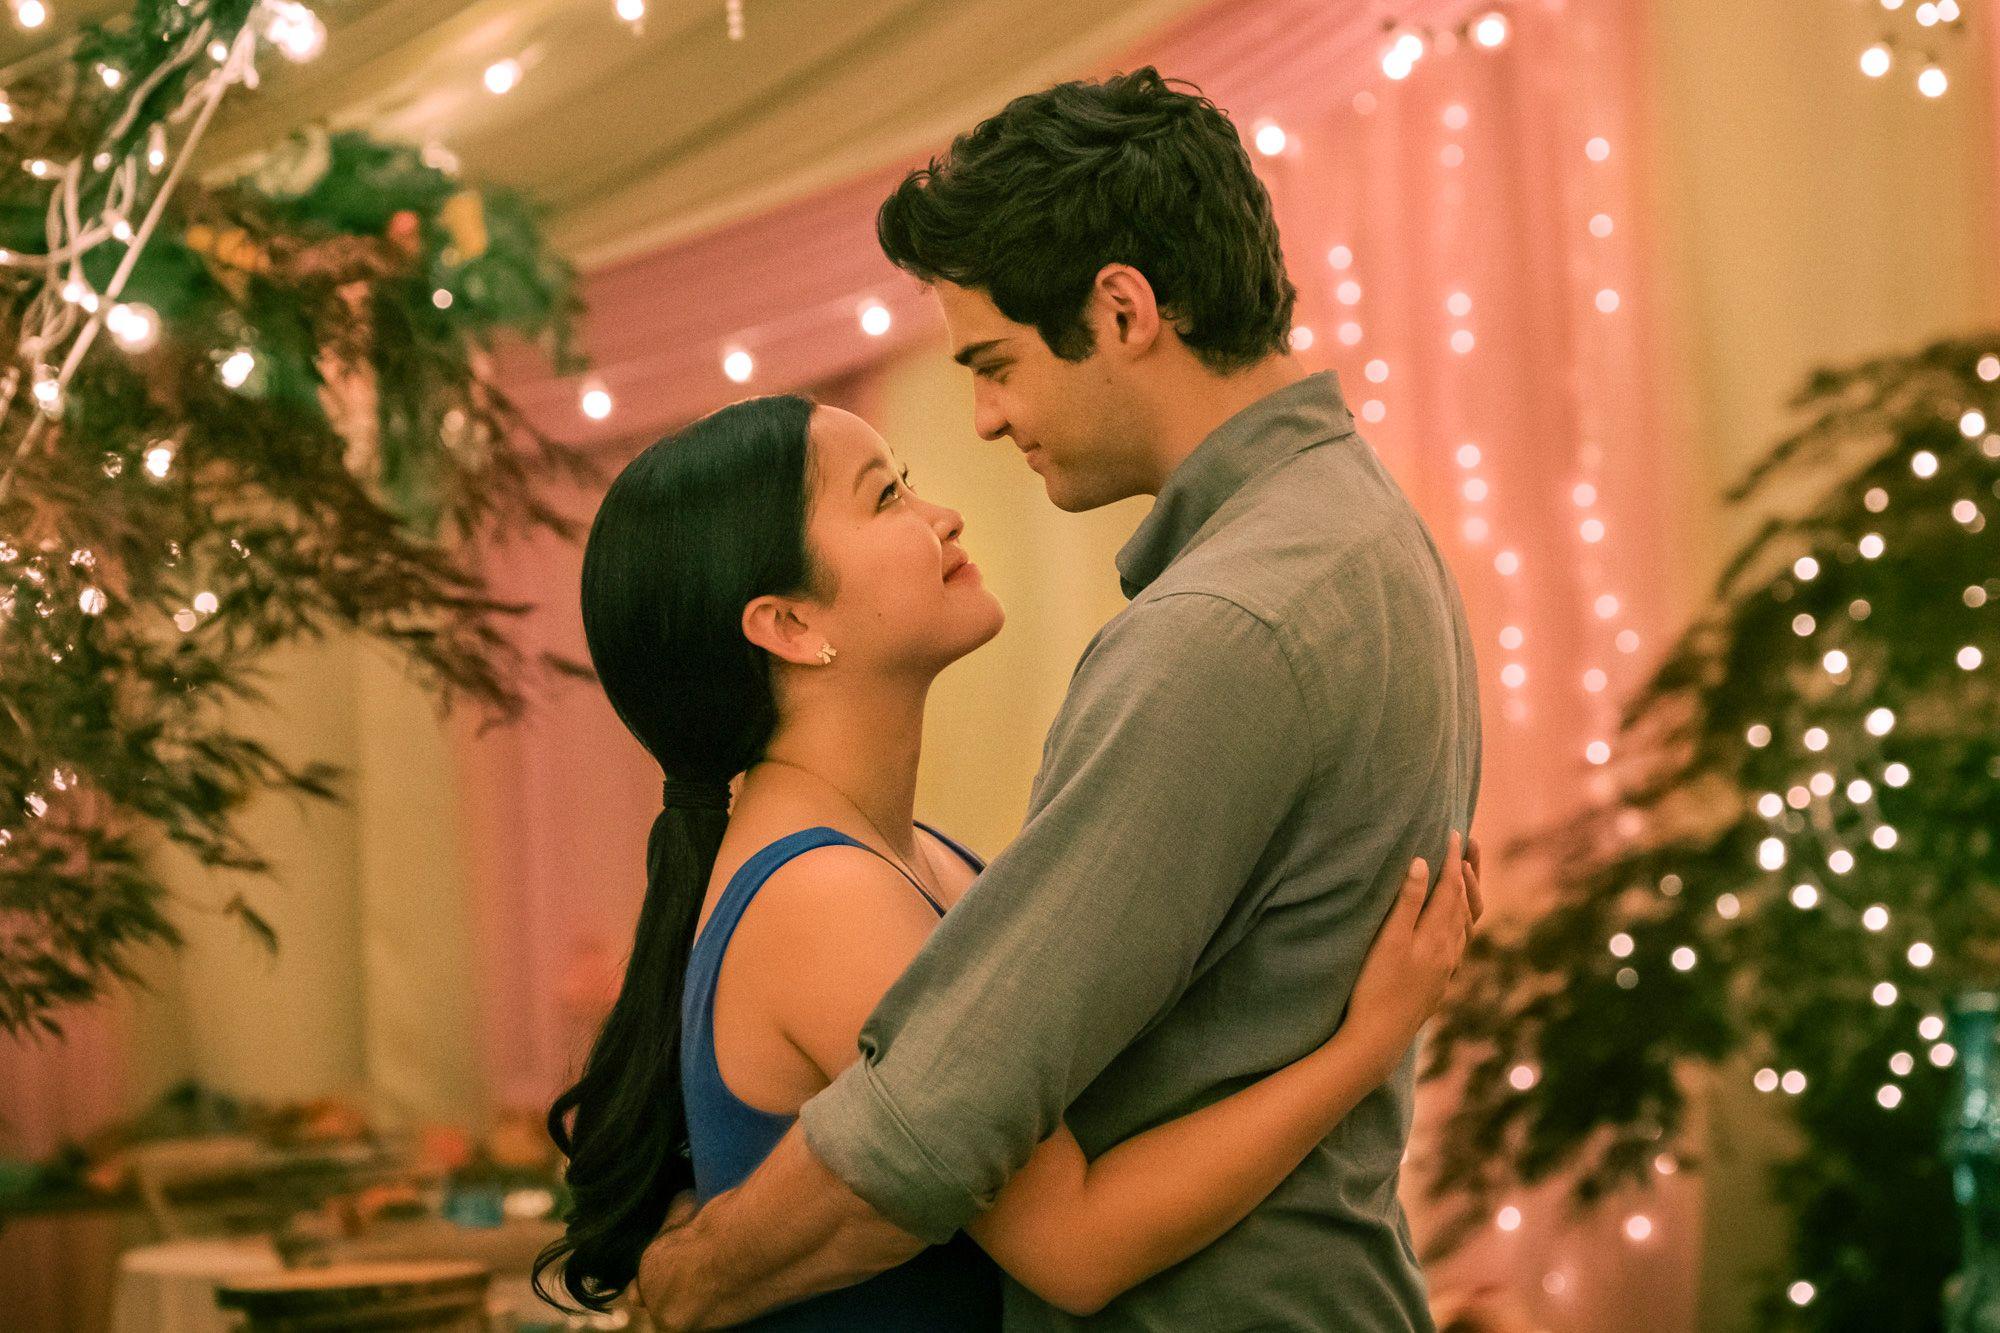 comedie romantică online dating alb și negru datând din marea britanie